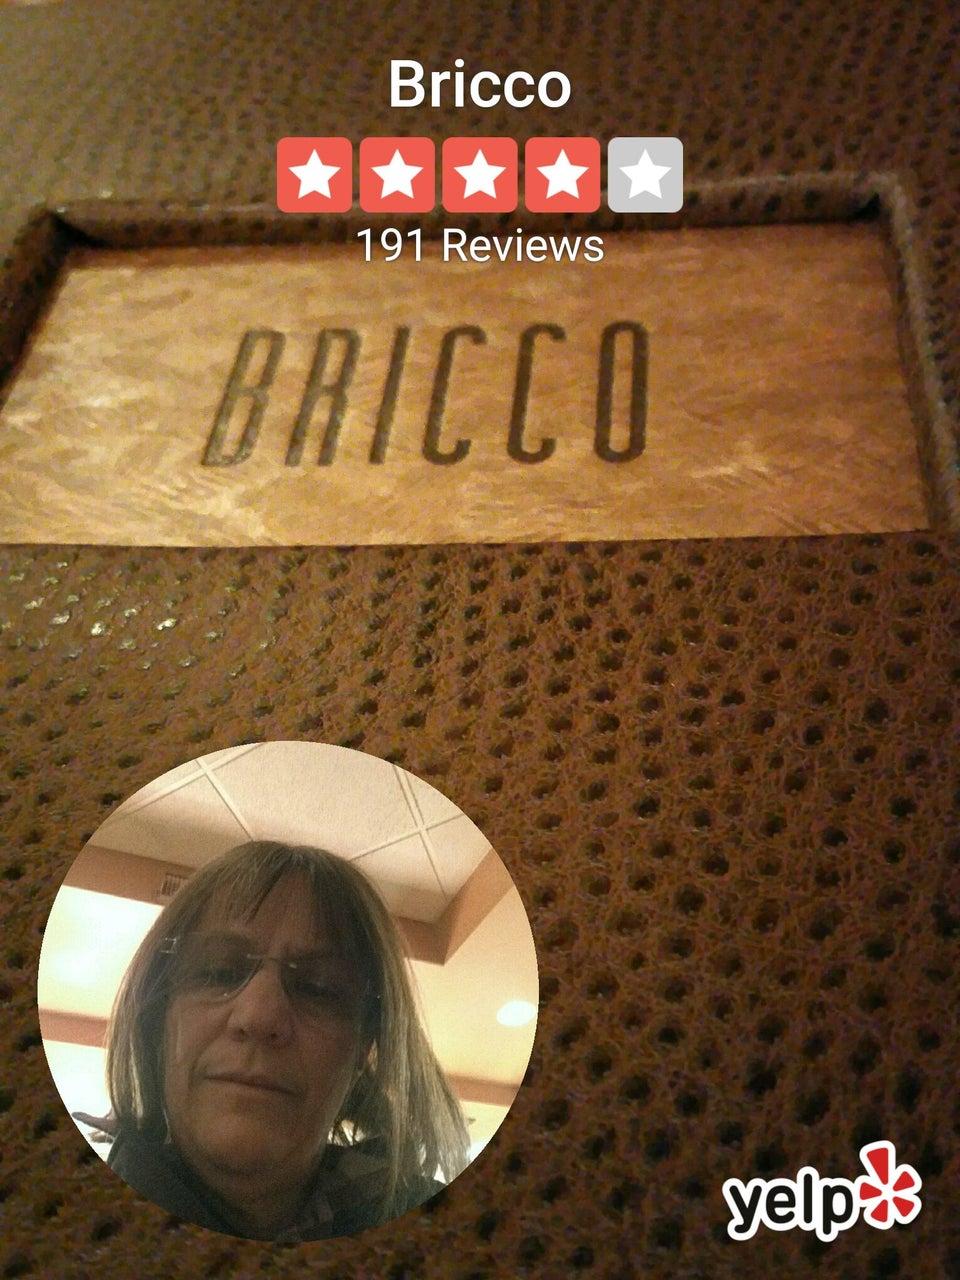 Photo of Bricco